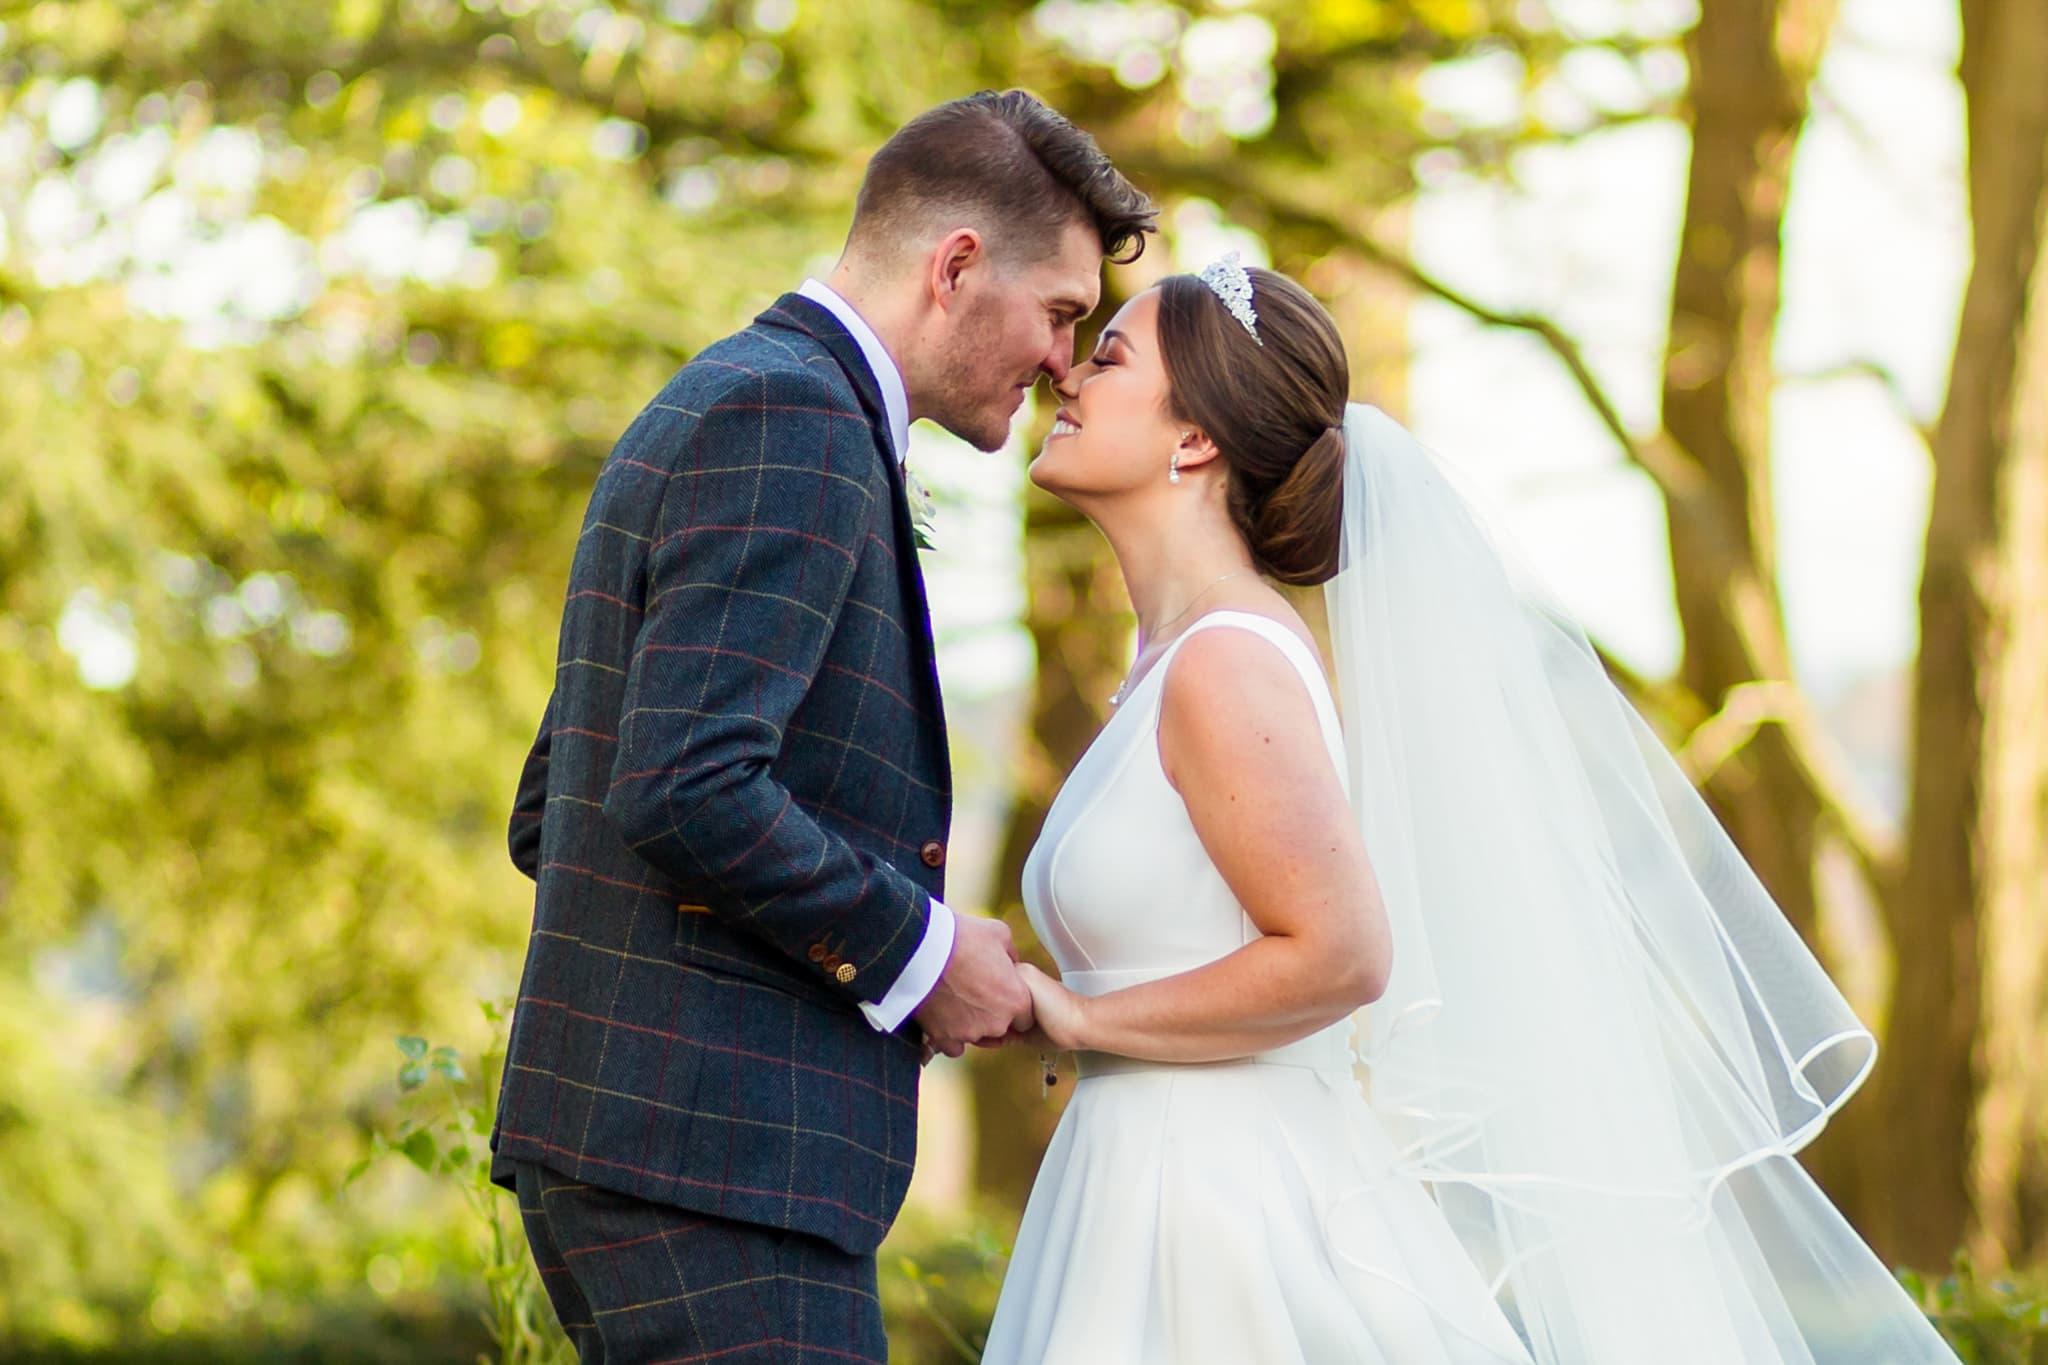 bride and groom portrait in surrey